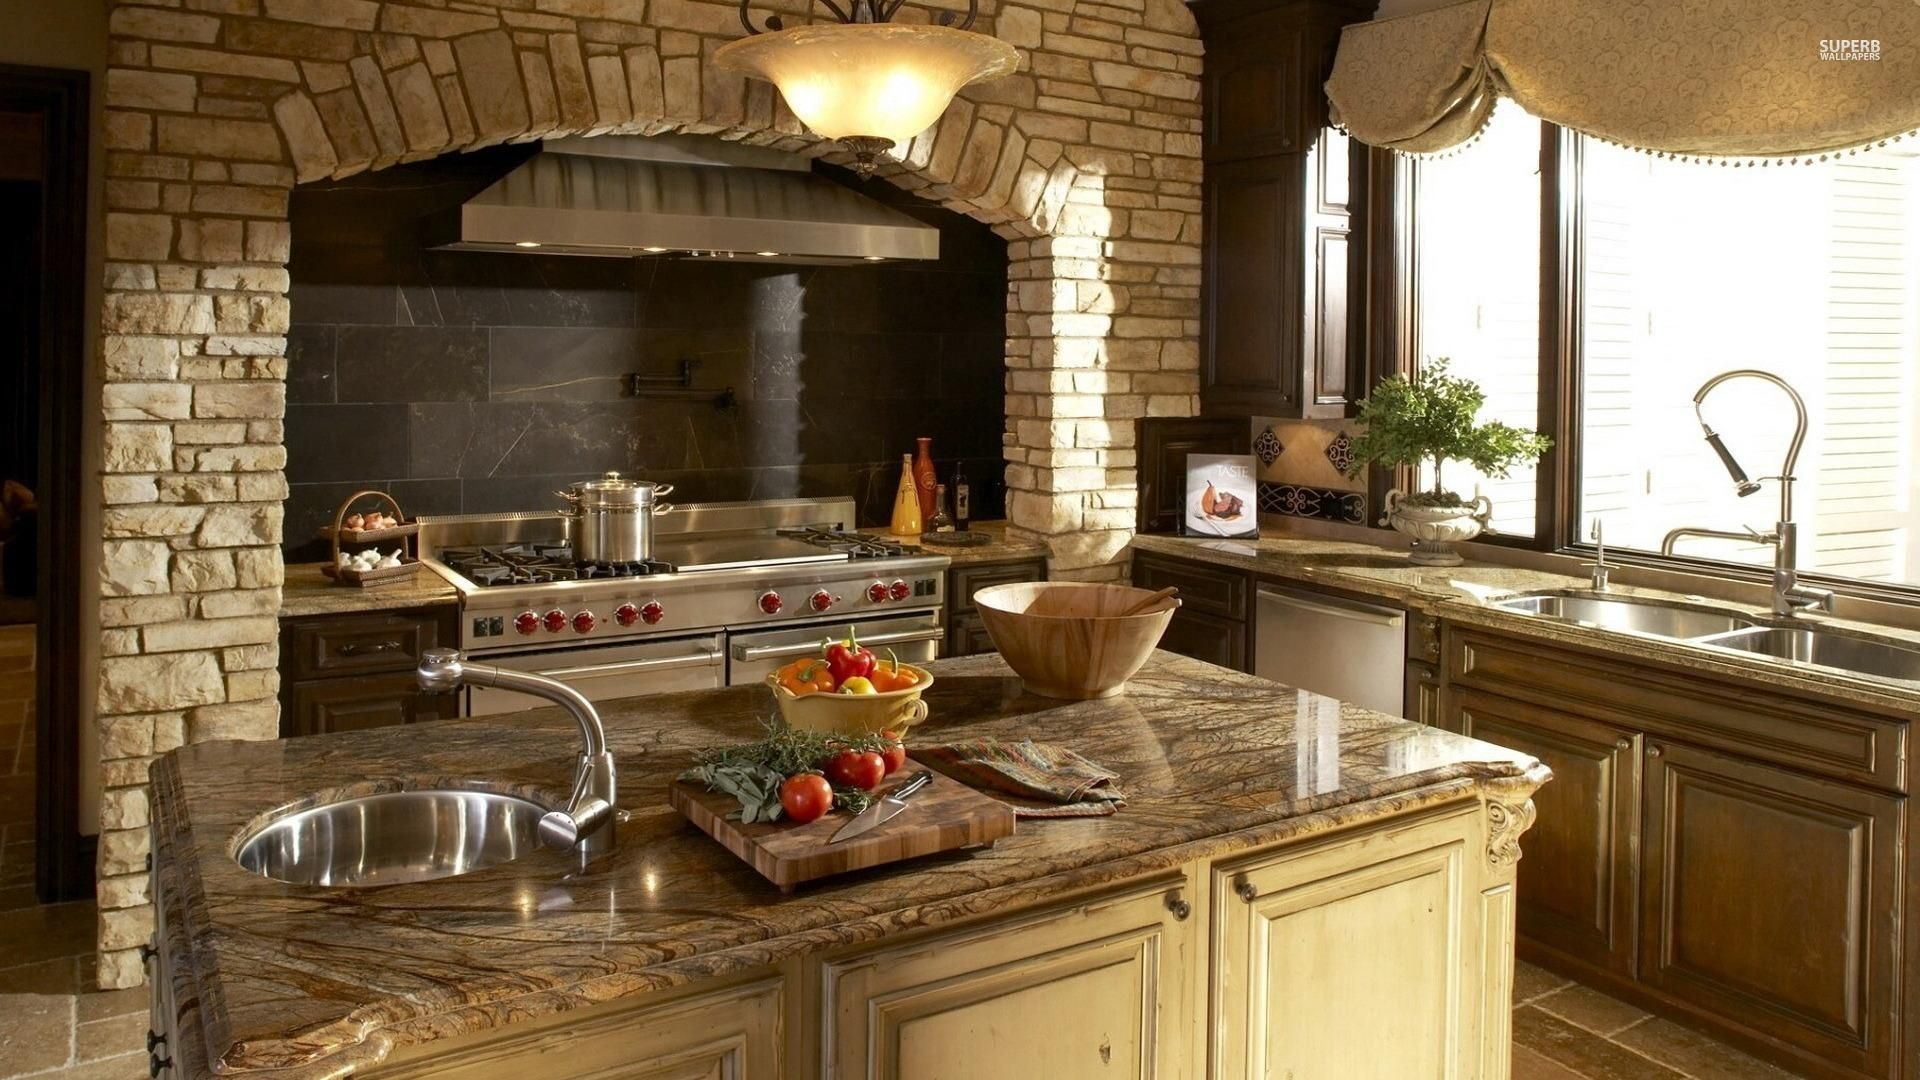 Mustard B Q Wallpaper High Definition Stone Kitchen Design Tuscan Kitchen Tuscan Kitchen Design